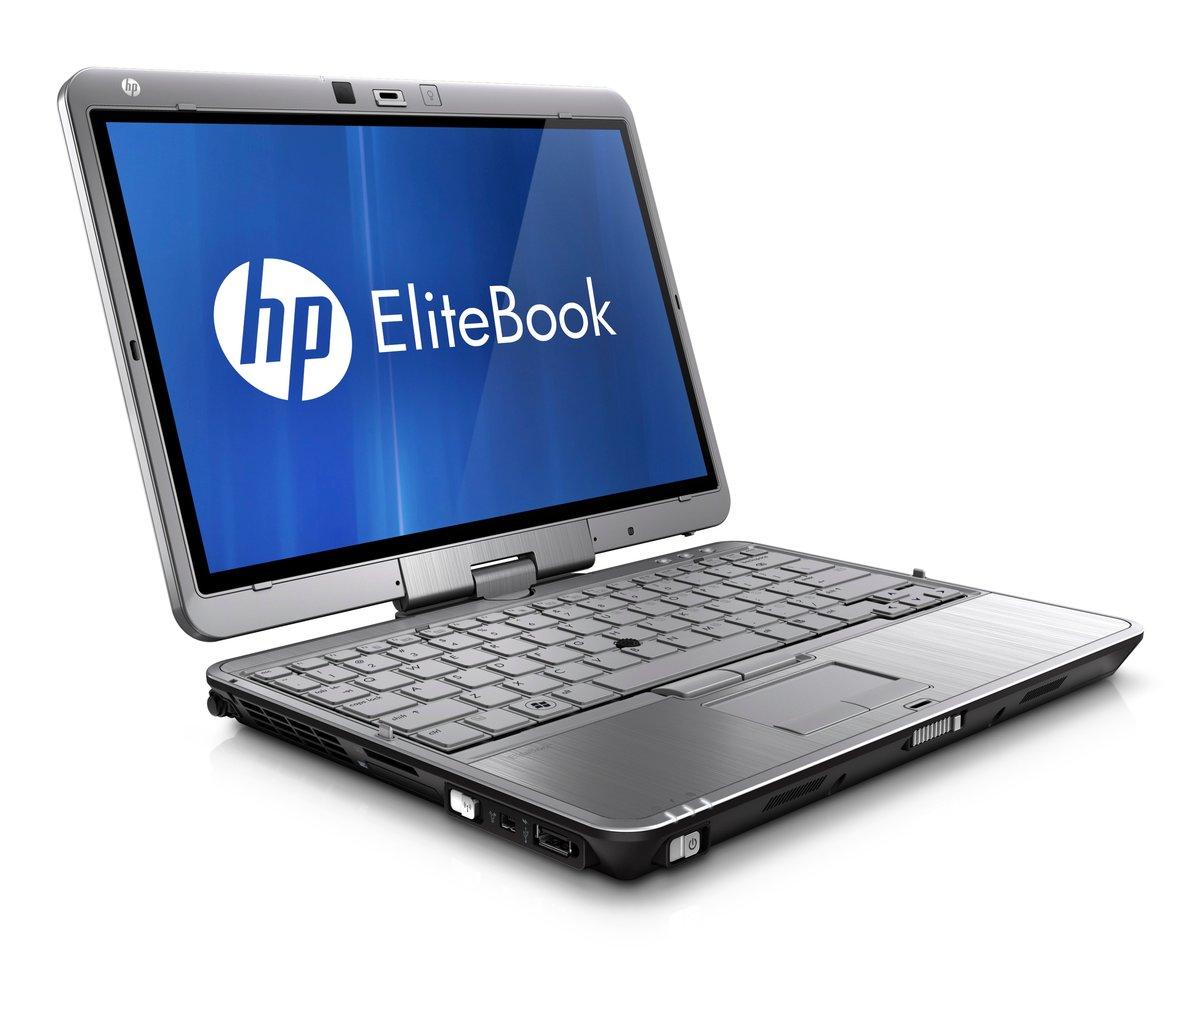 HP 12 1 Core i7 processor 160GB SSD Tablet PC